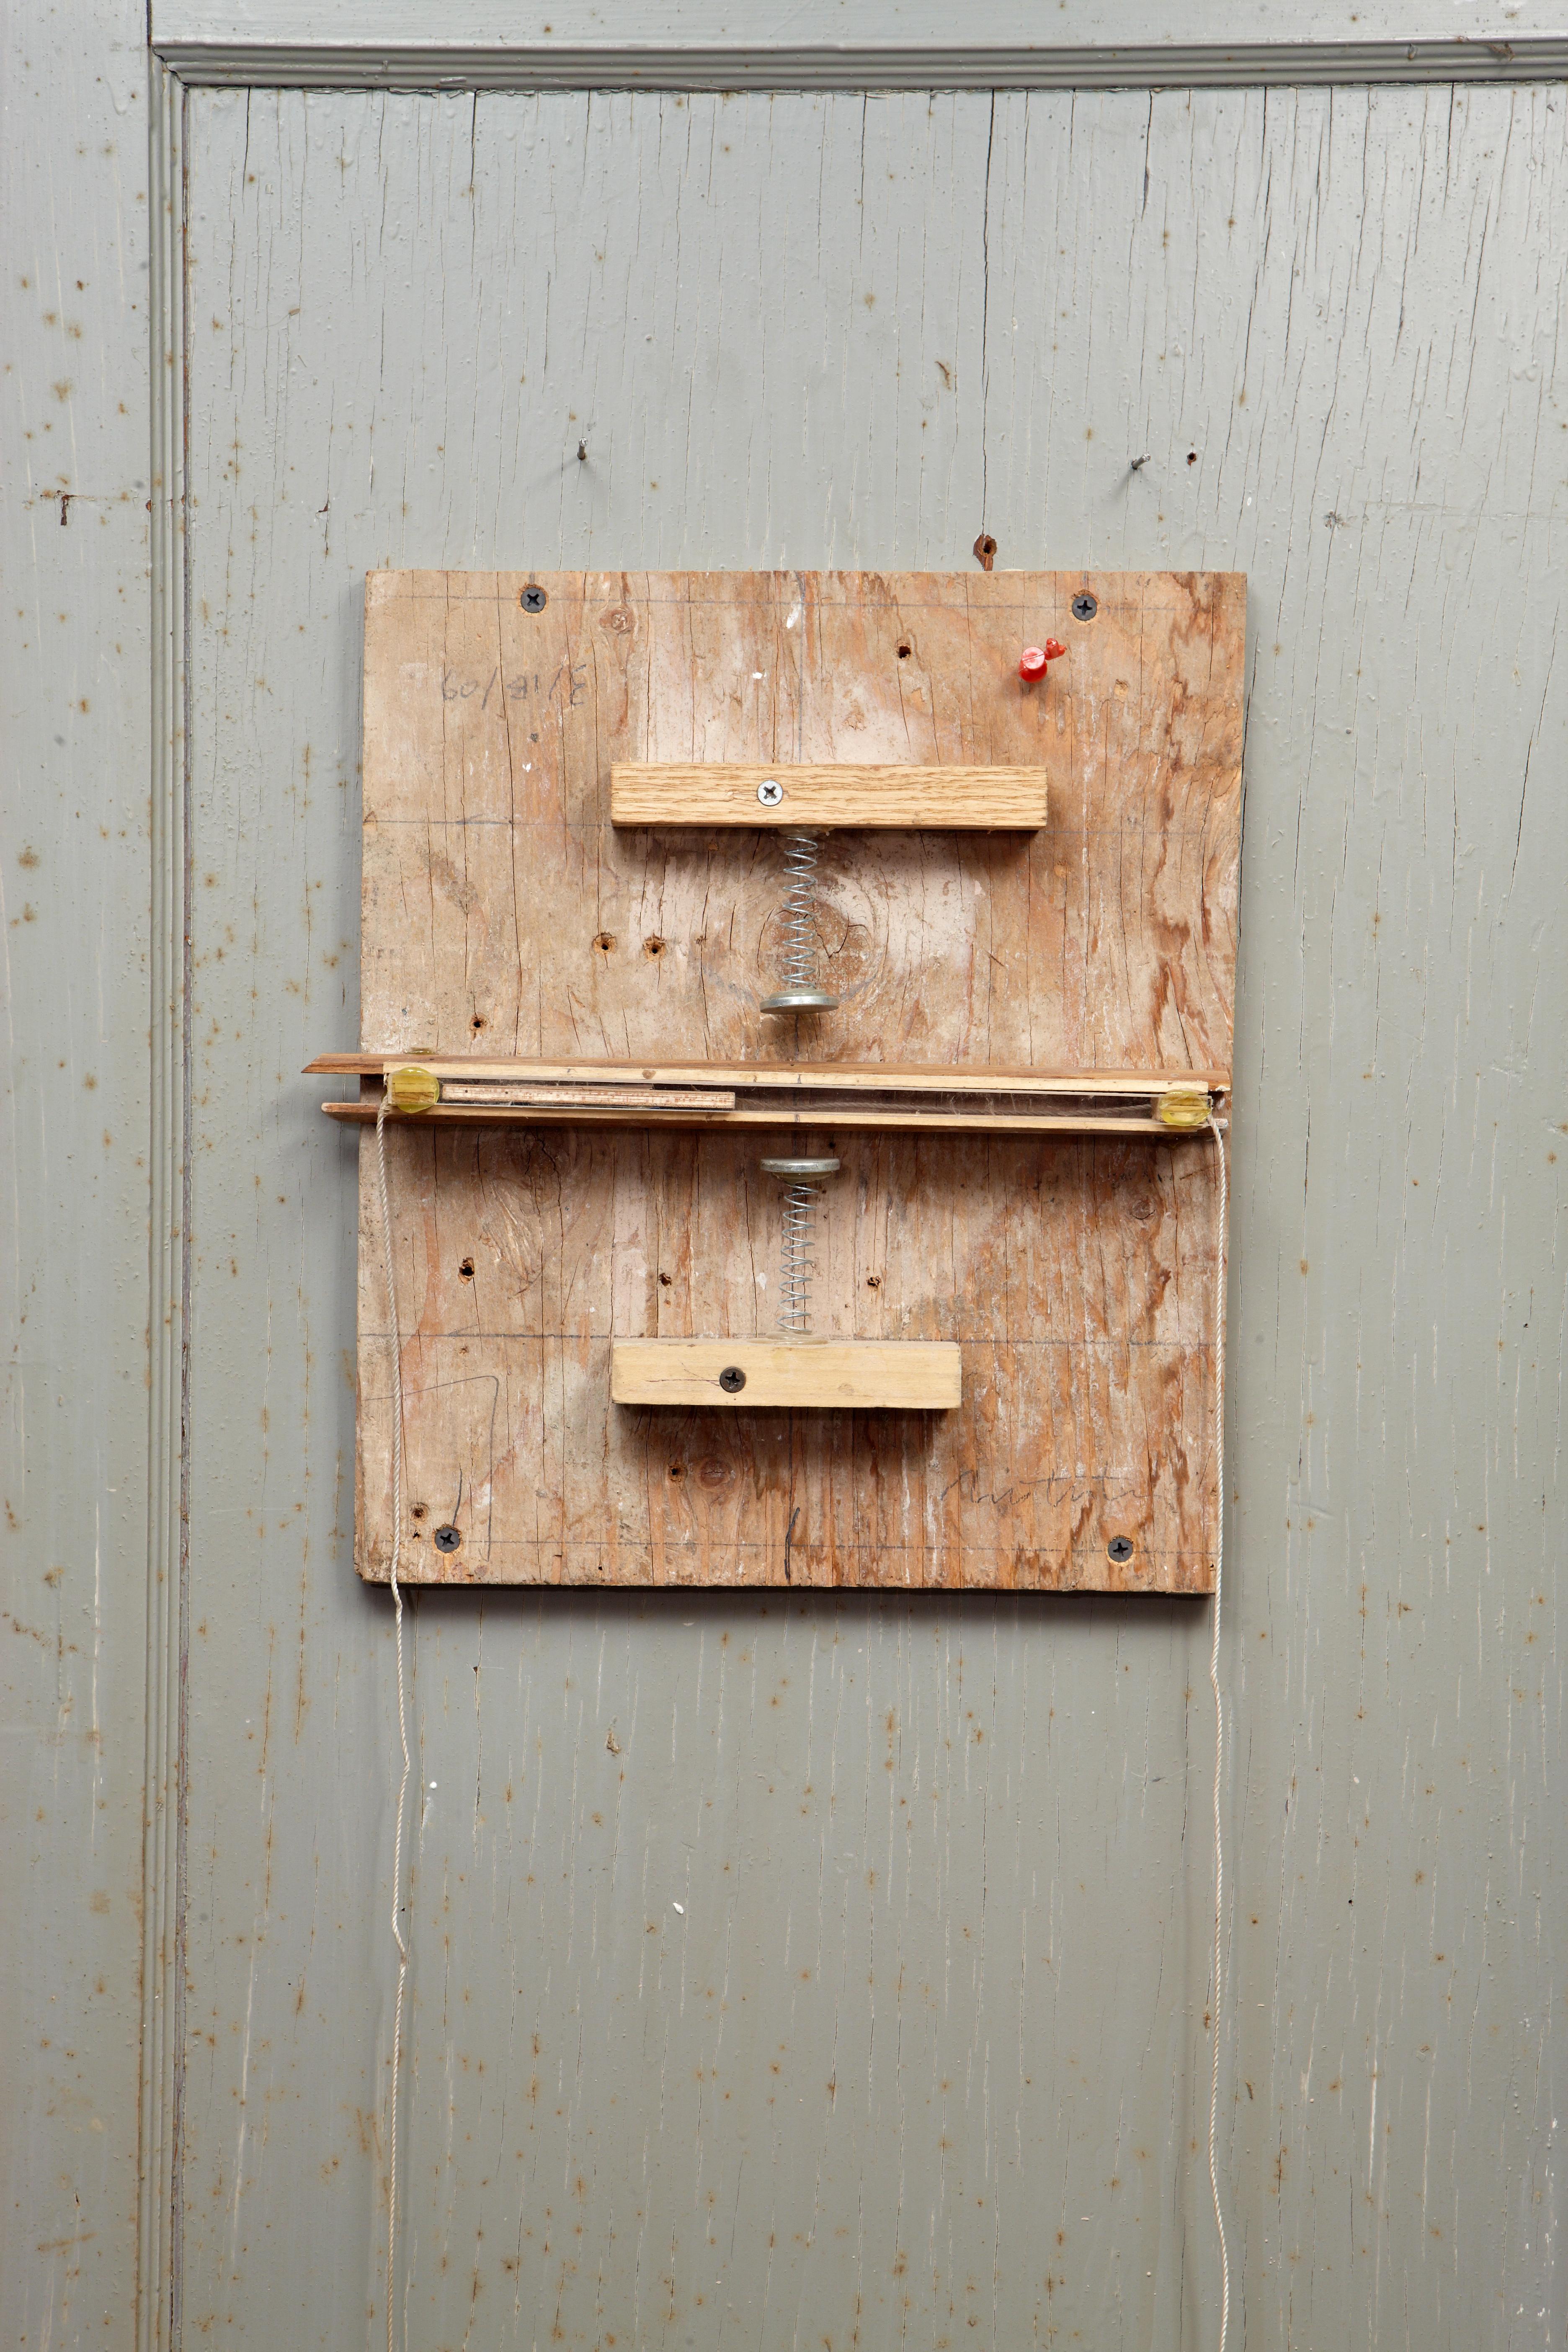 untitled (knock knock), 2009